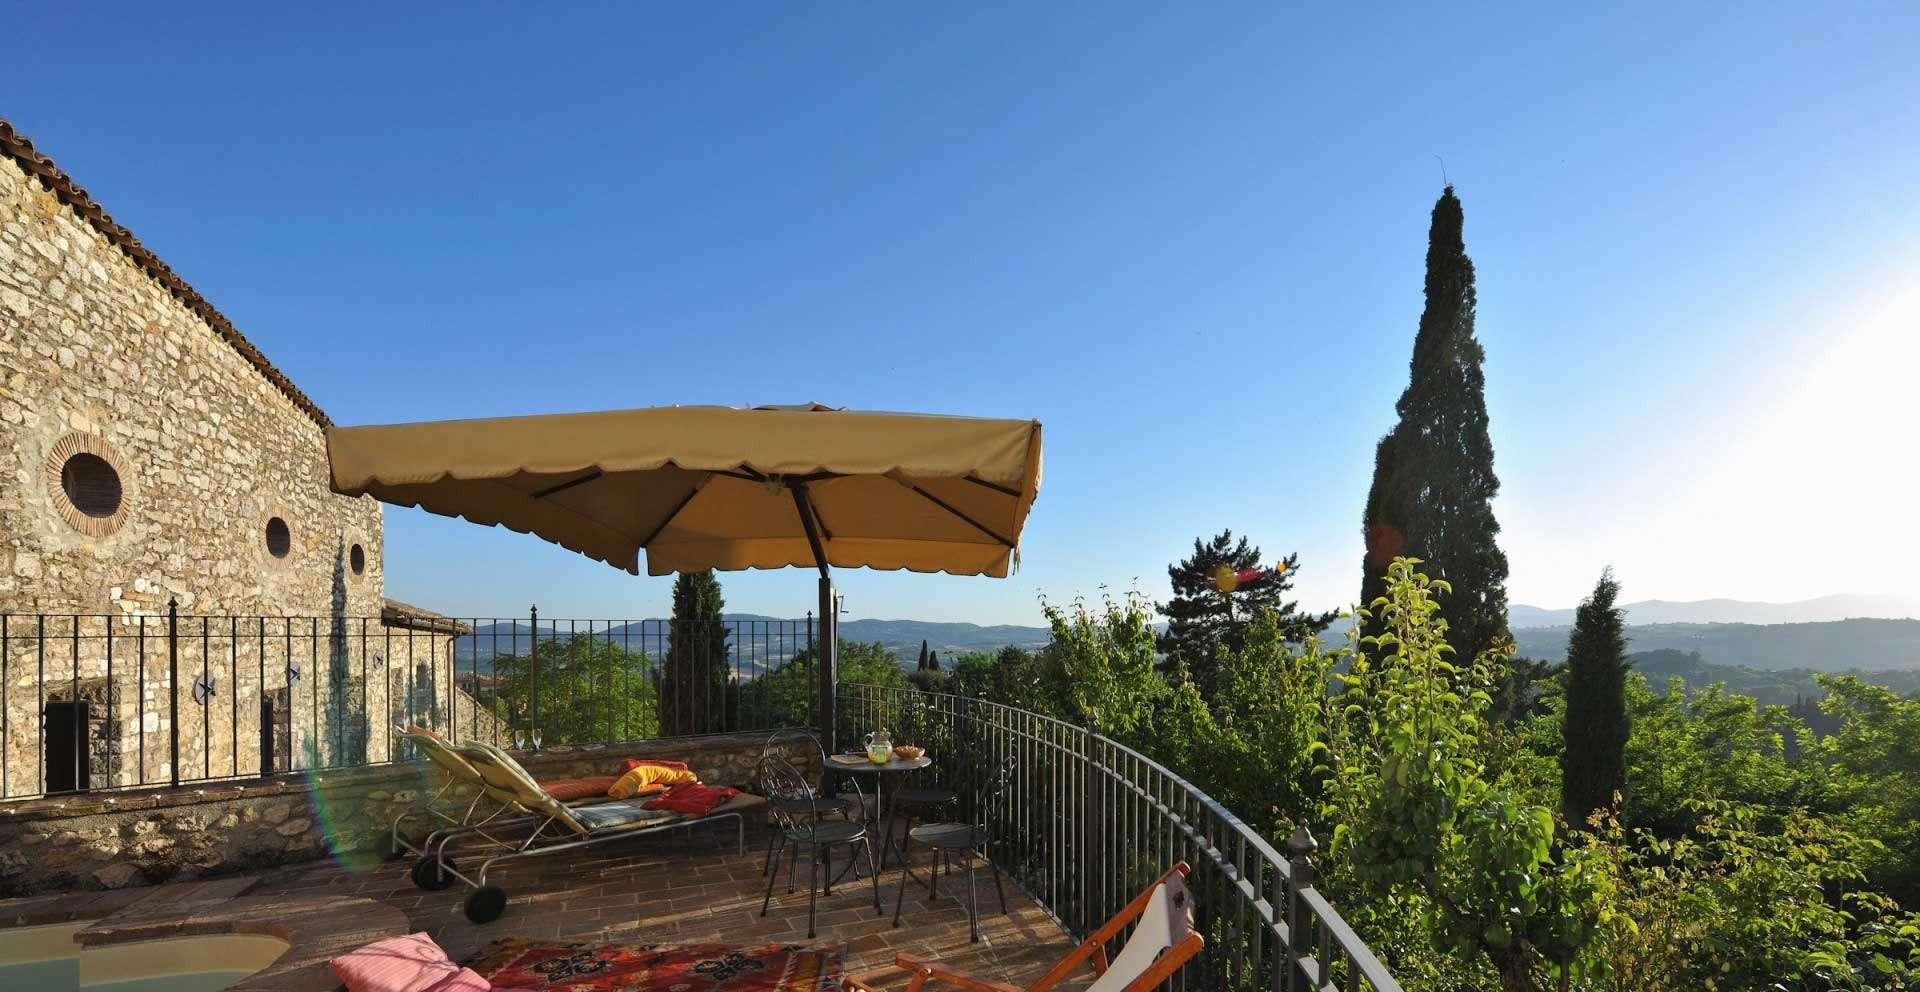 Seating terrace at Santi Terzi villa in Umbria